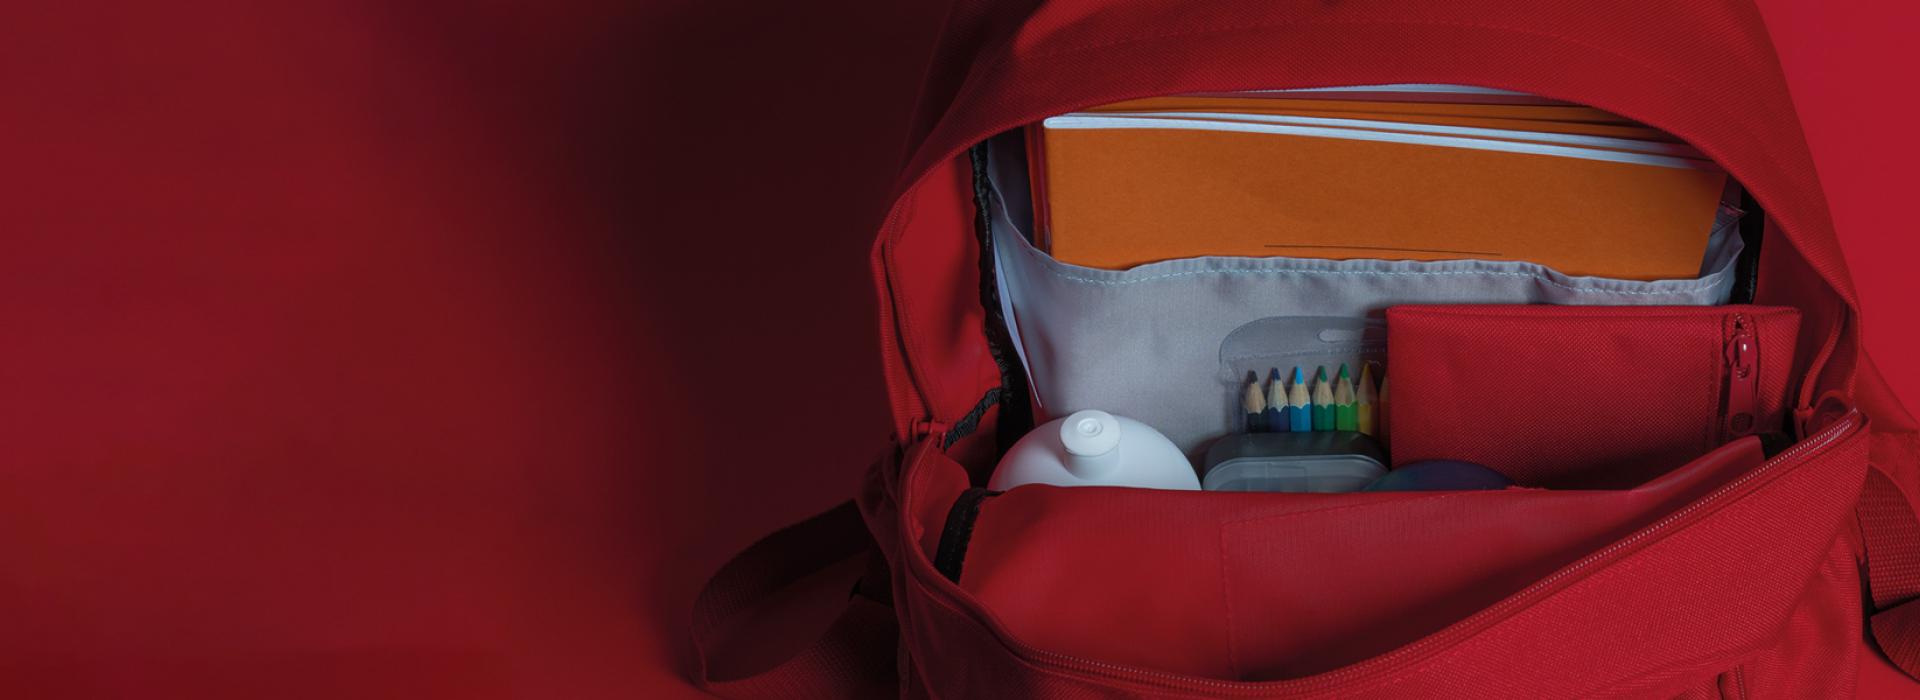 Inside the School Bag